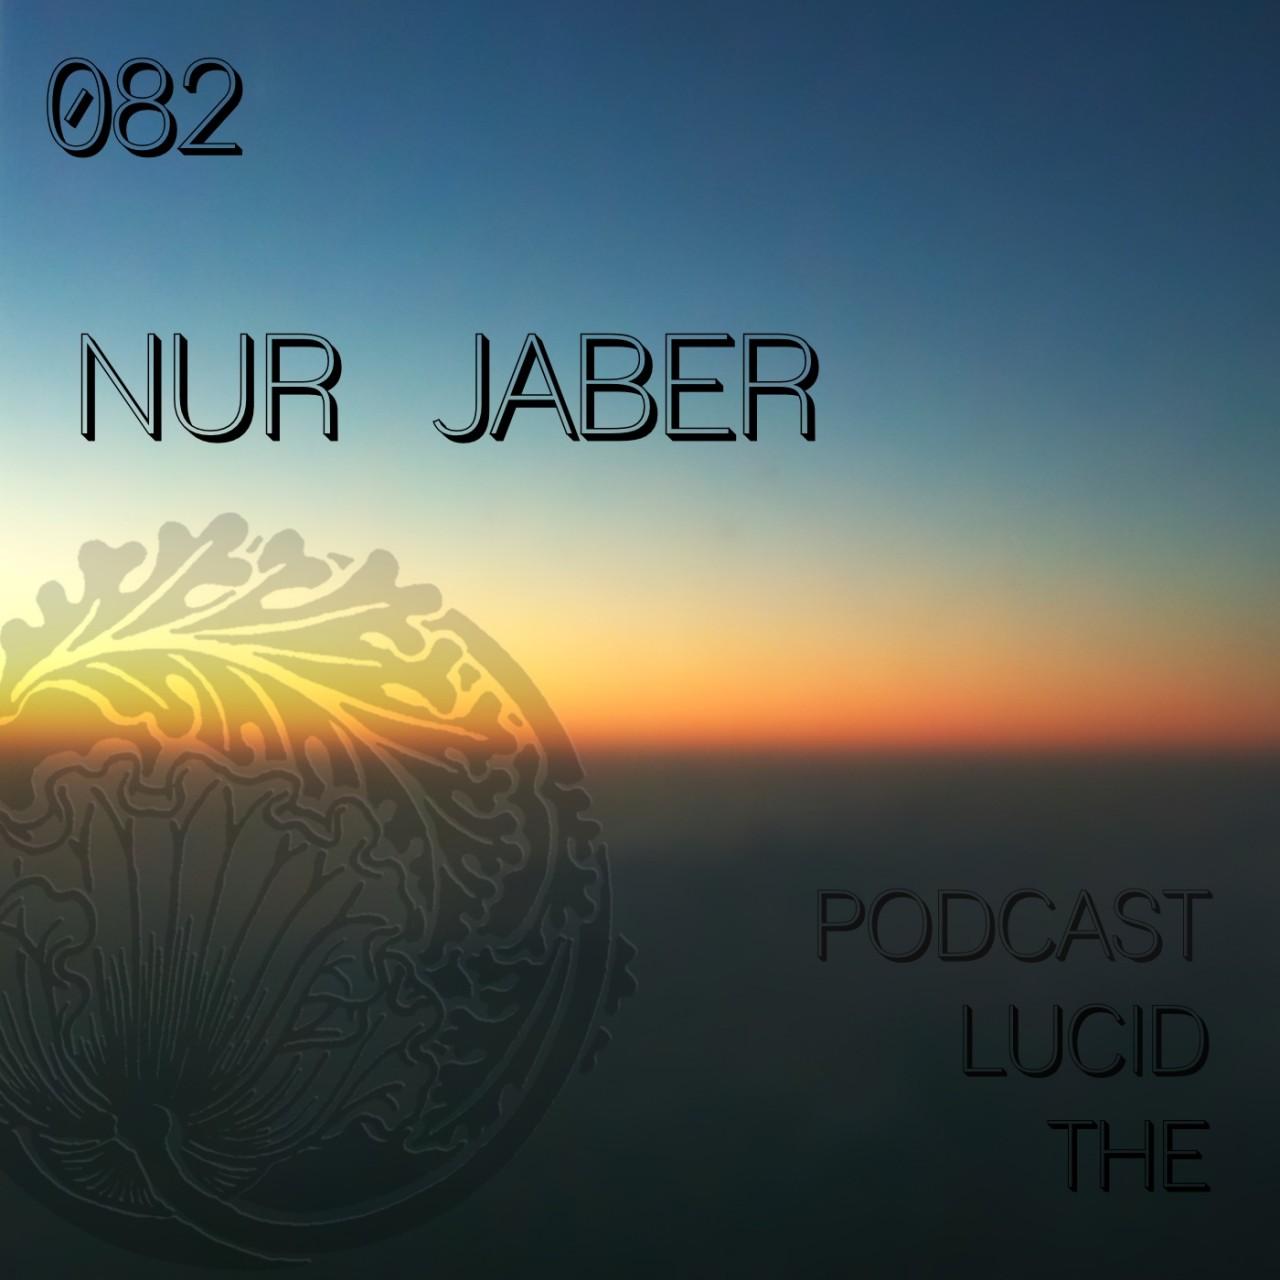 The Lucid Podcast 082 Nur Jaber